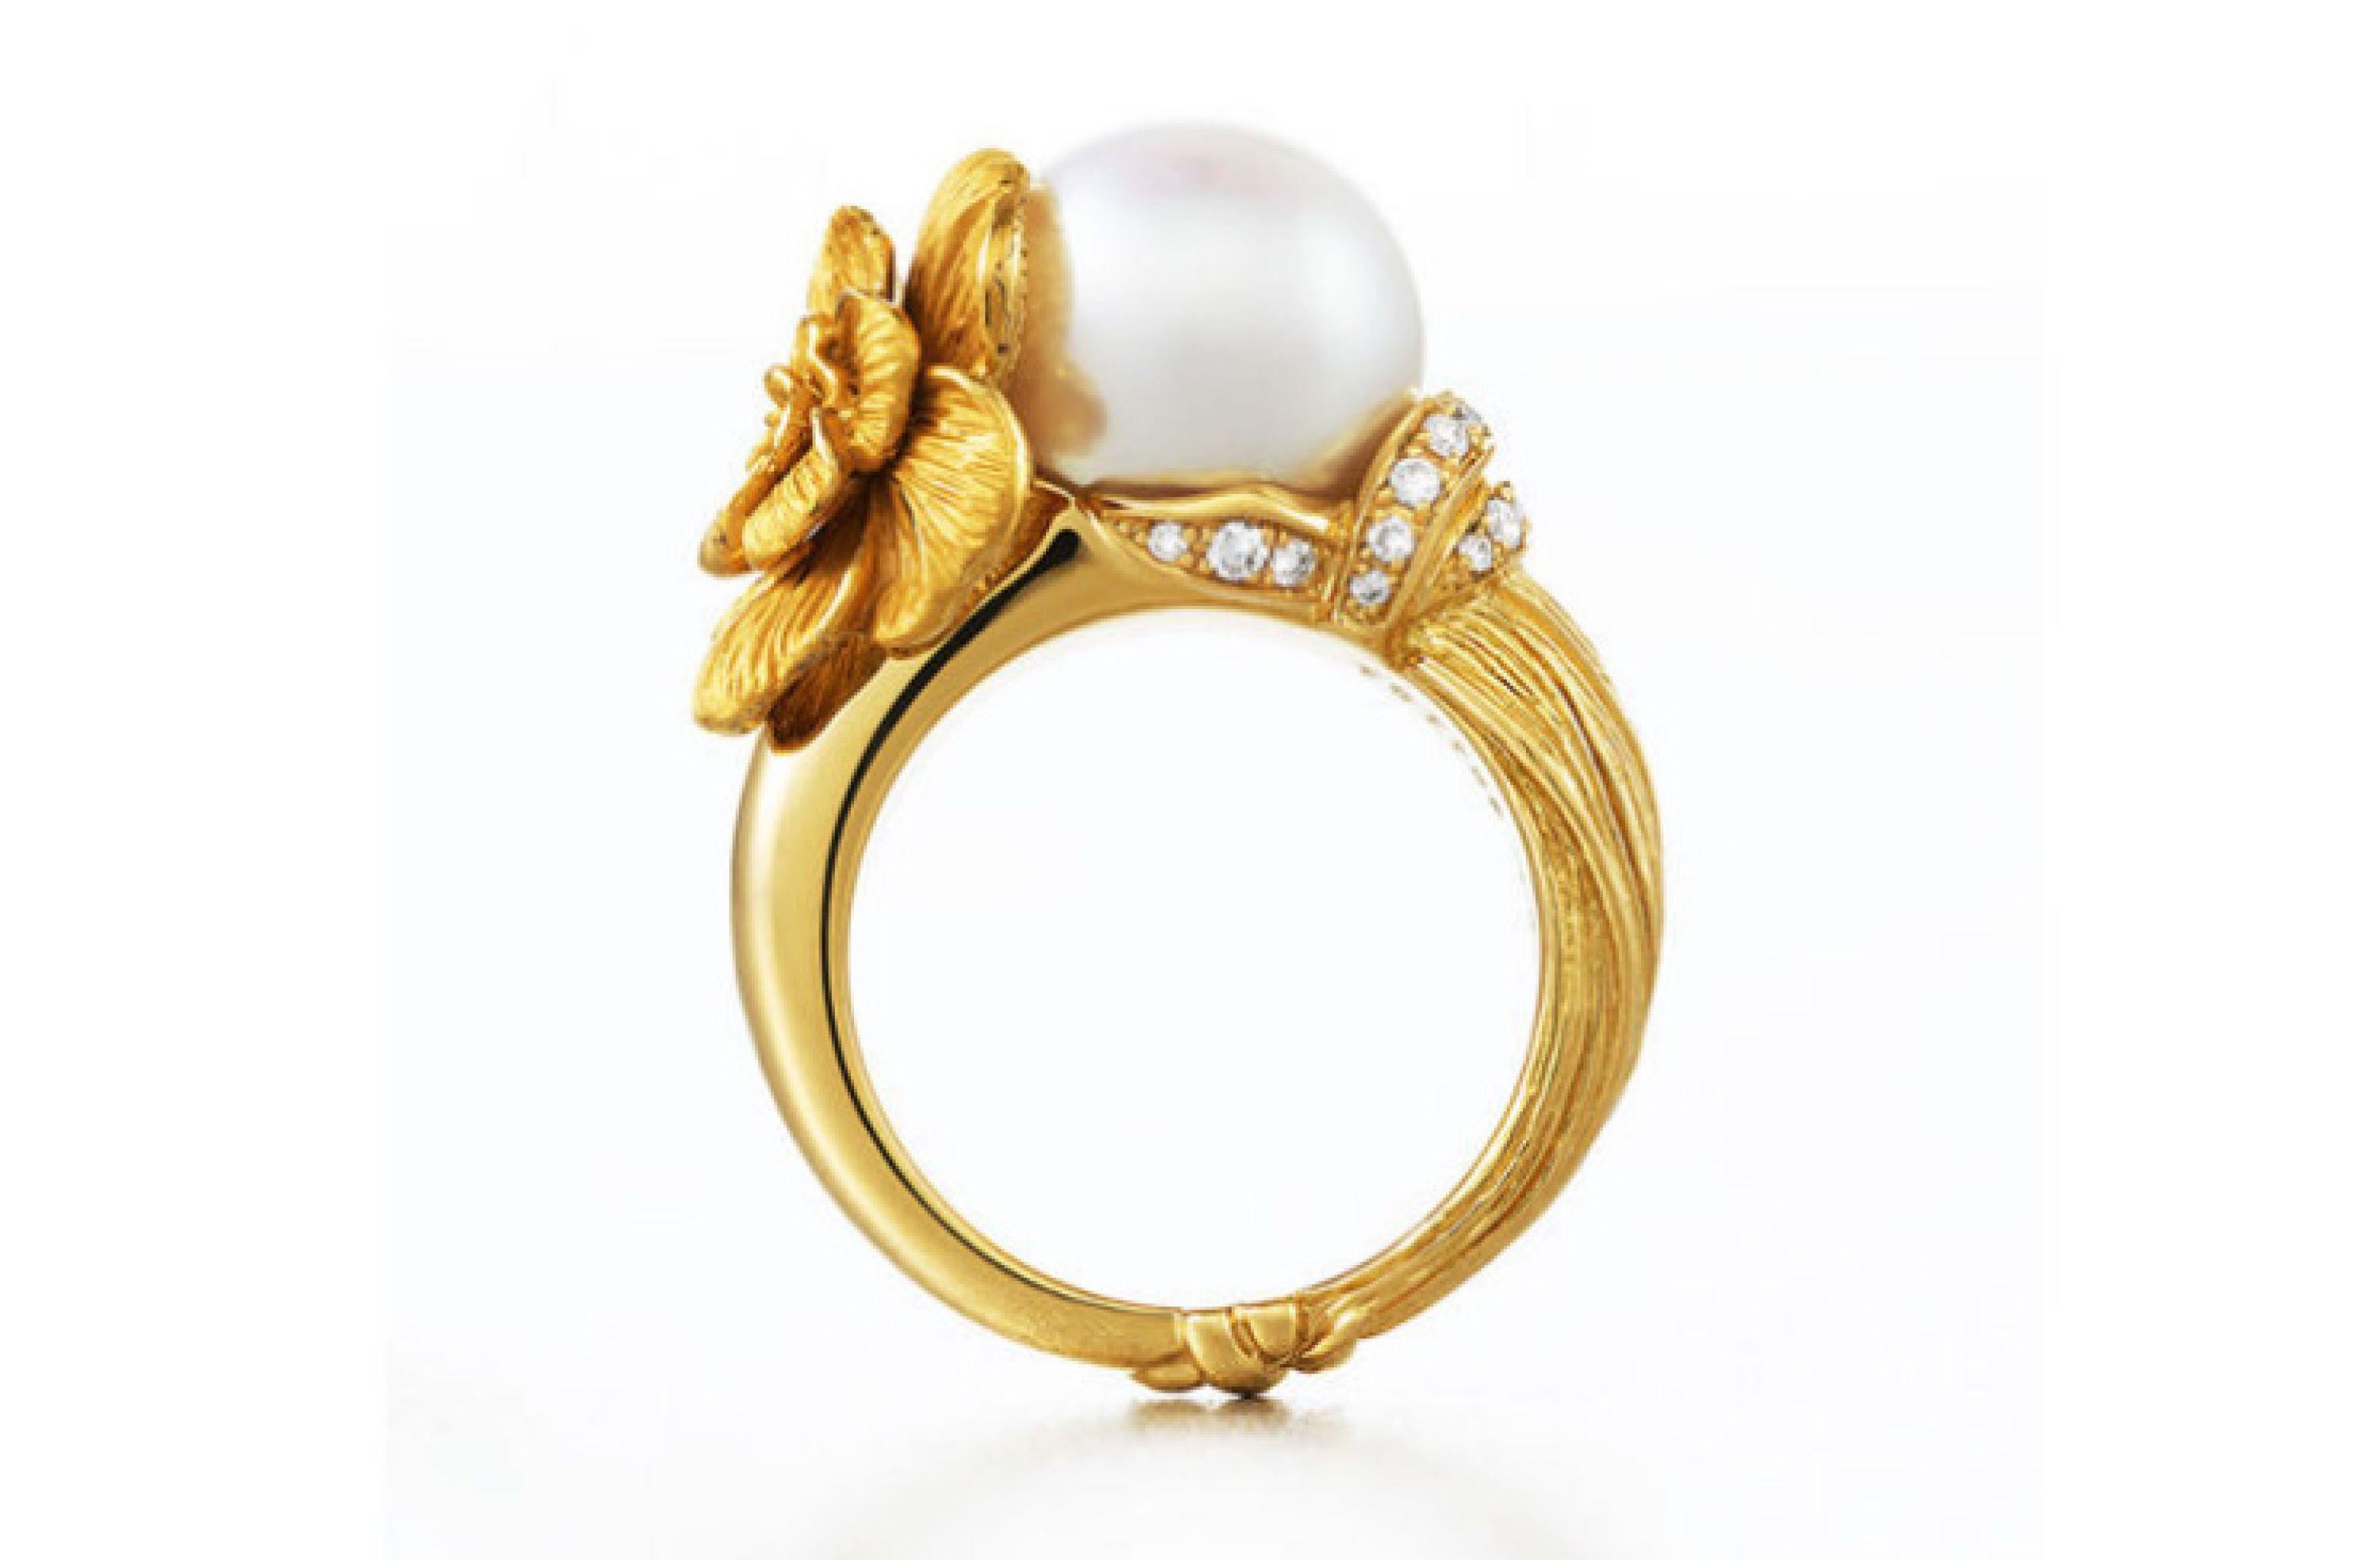 JewelryWhite_15.jpg